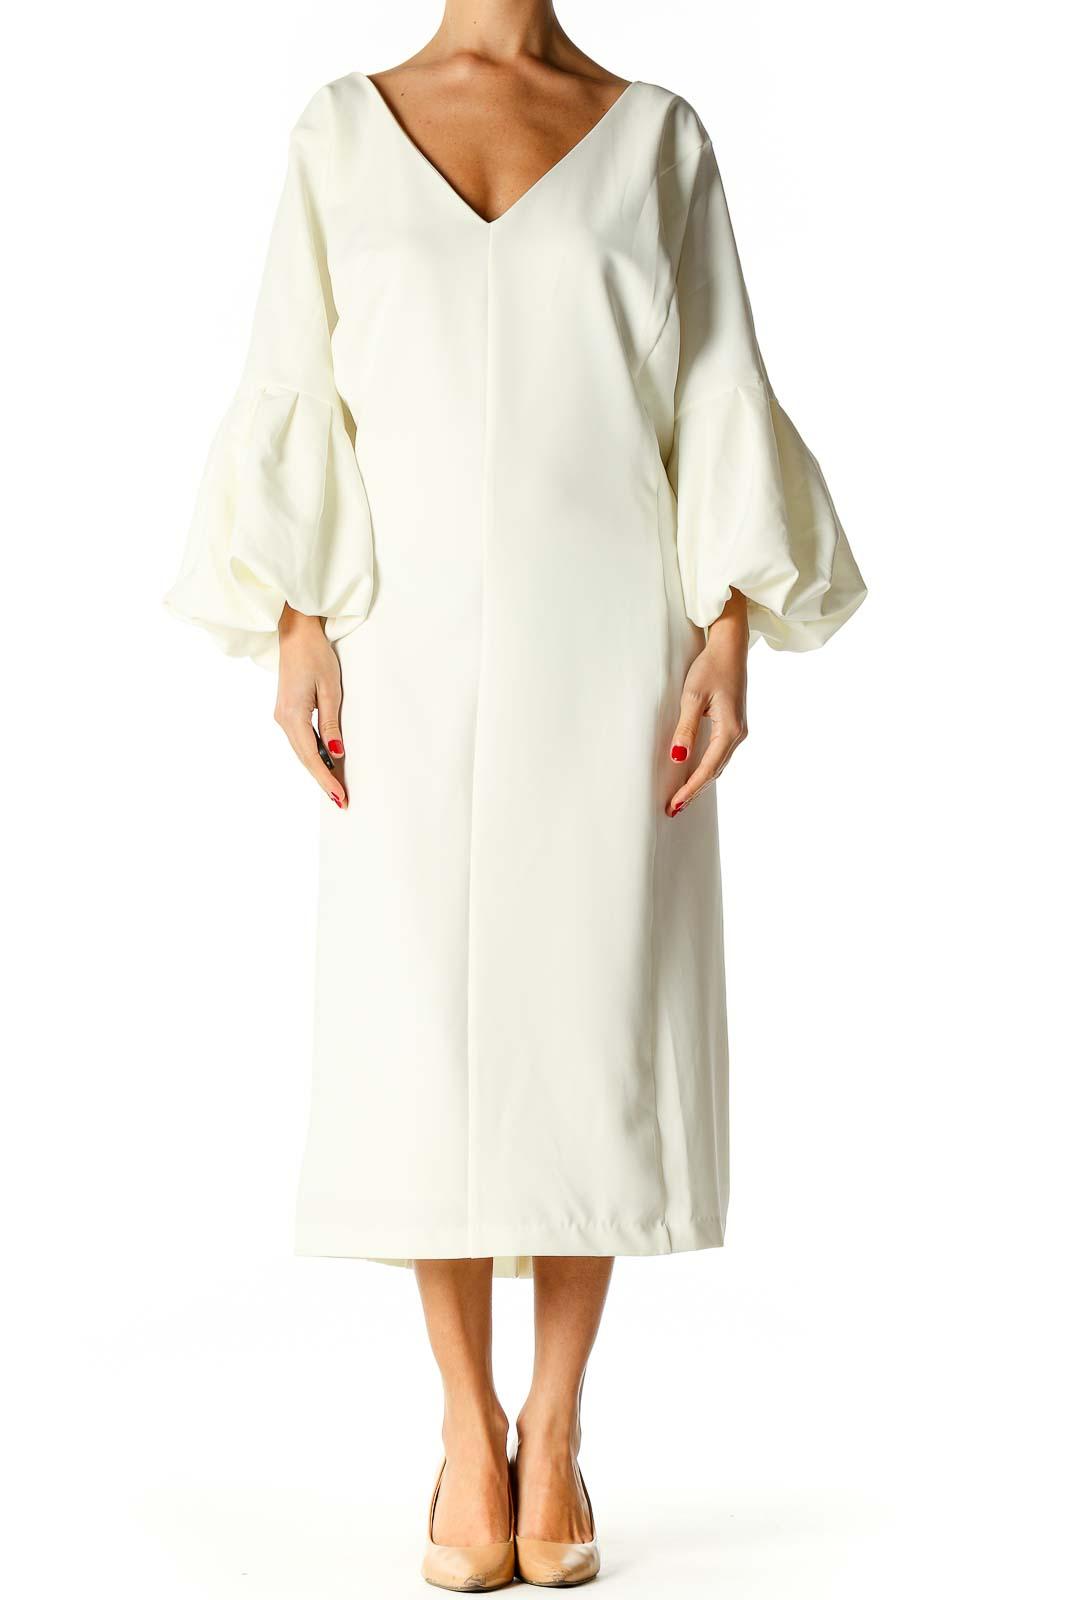 Beige Solid Classic Column Dress Front